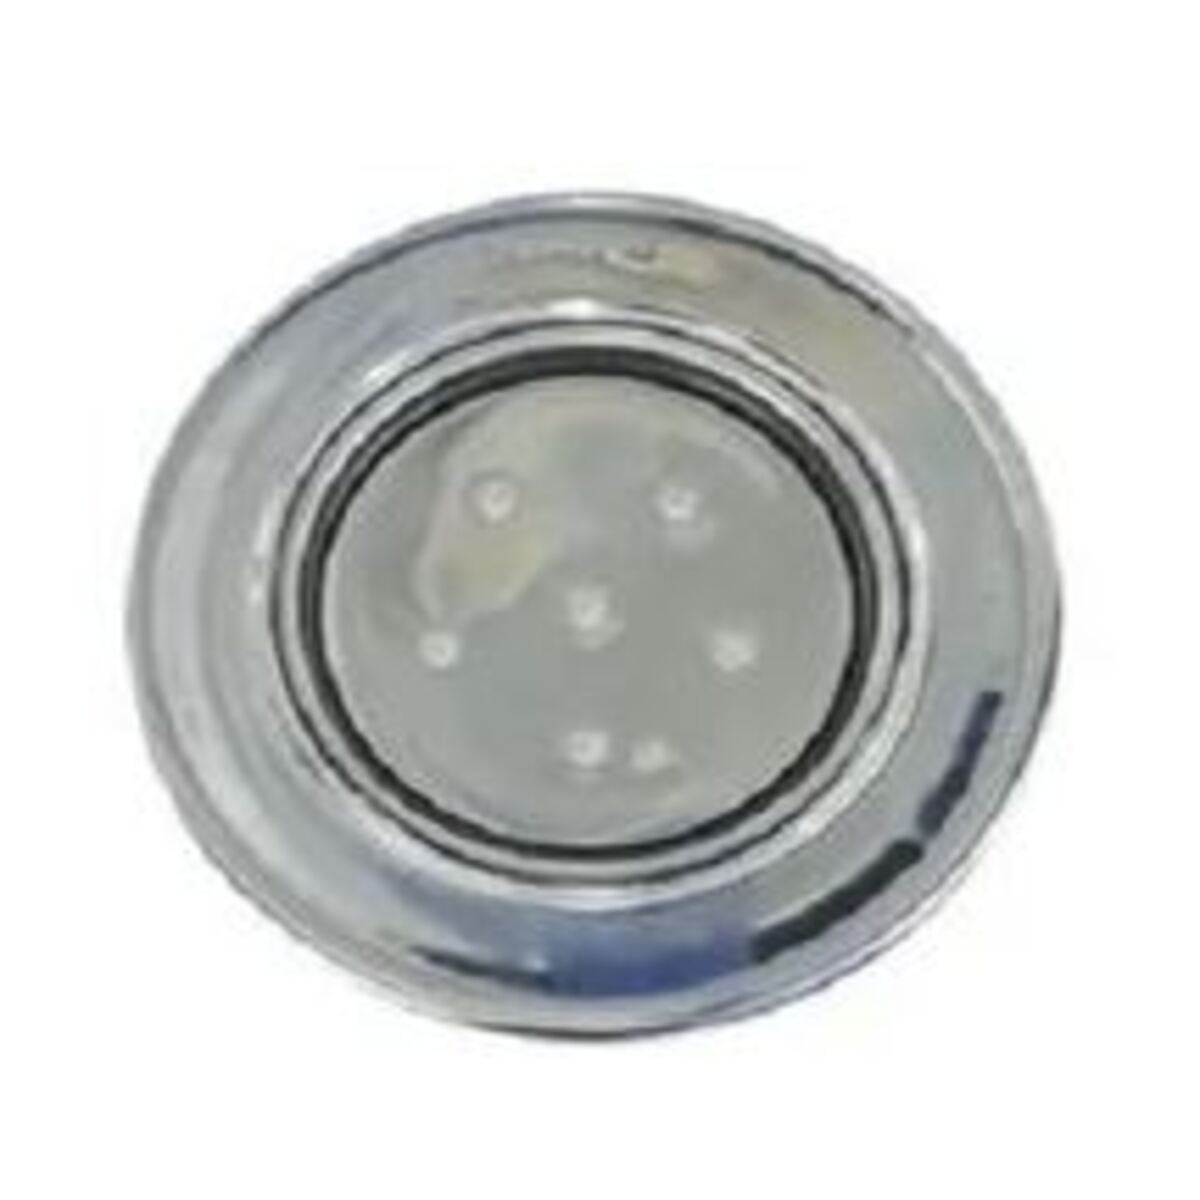 "Refletor Steel Super Led 6 Azul Inox com Plug 1/2"" Pooltec"